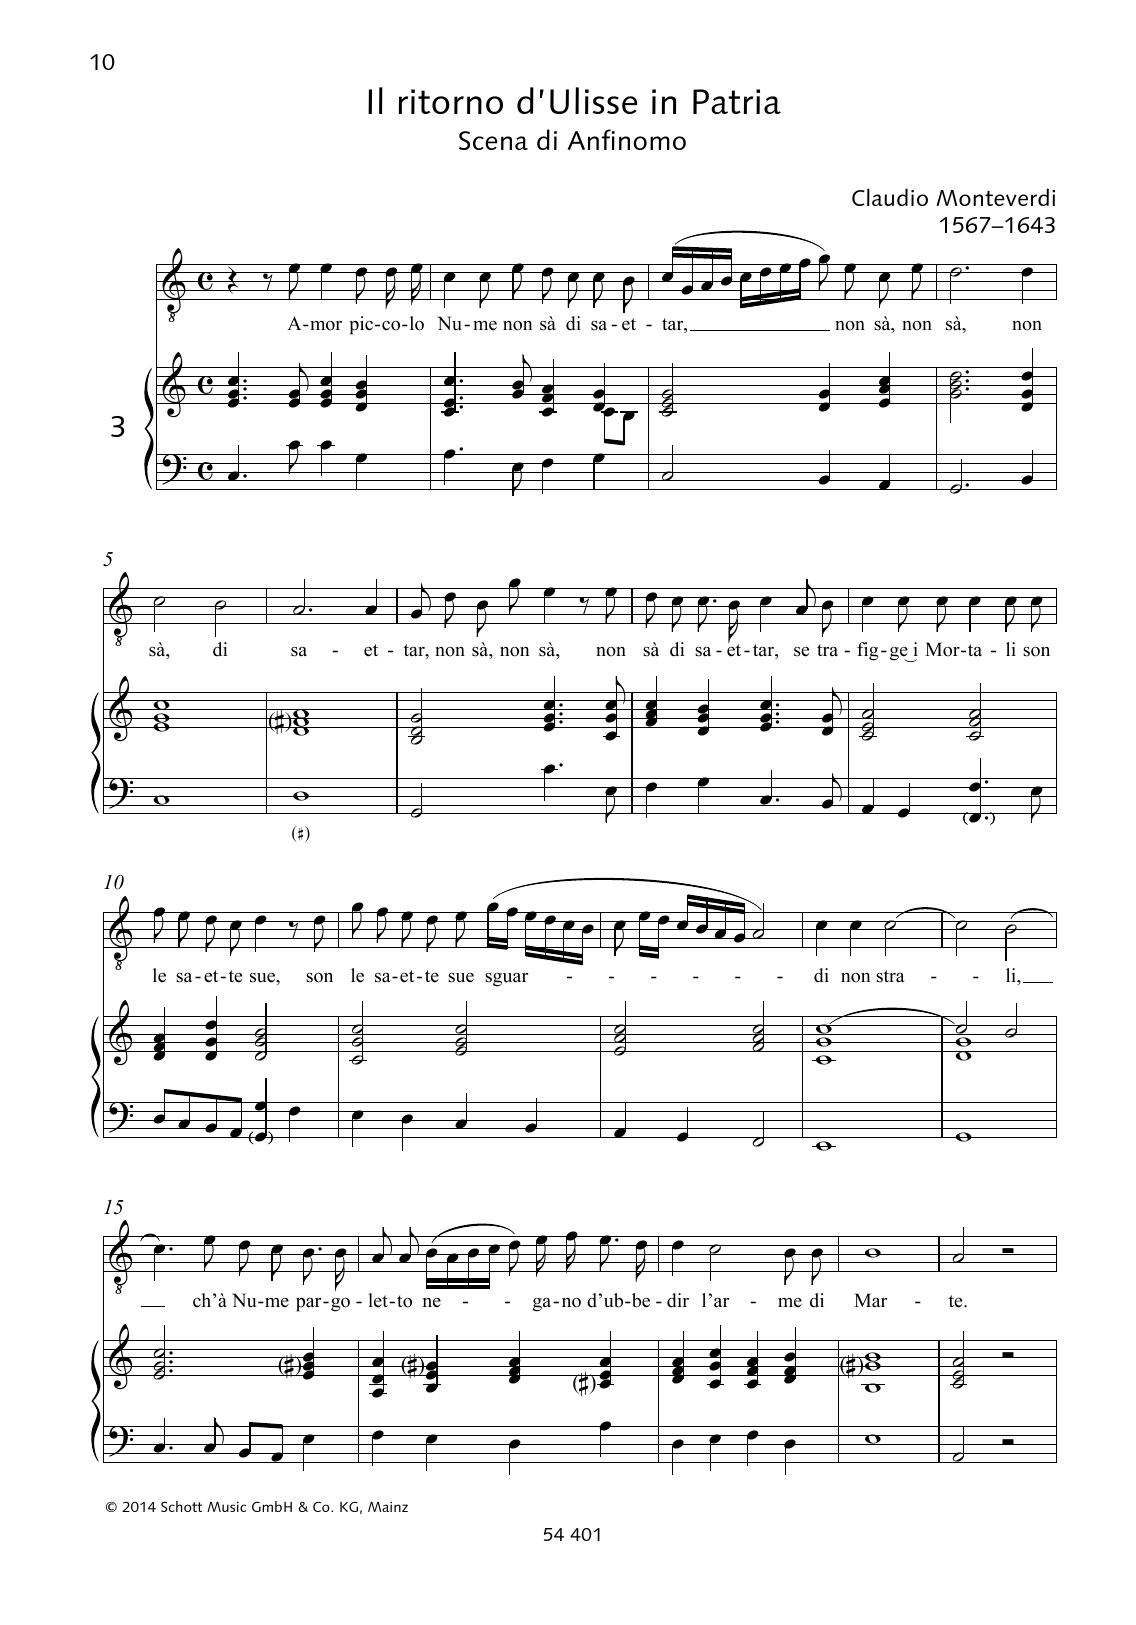 Claudio Monteverdi Amor piccolo Nume non sà di saettar sheet music preview music notes and score for Piano & Vocal including 2 page(s)